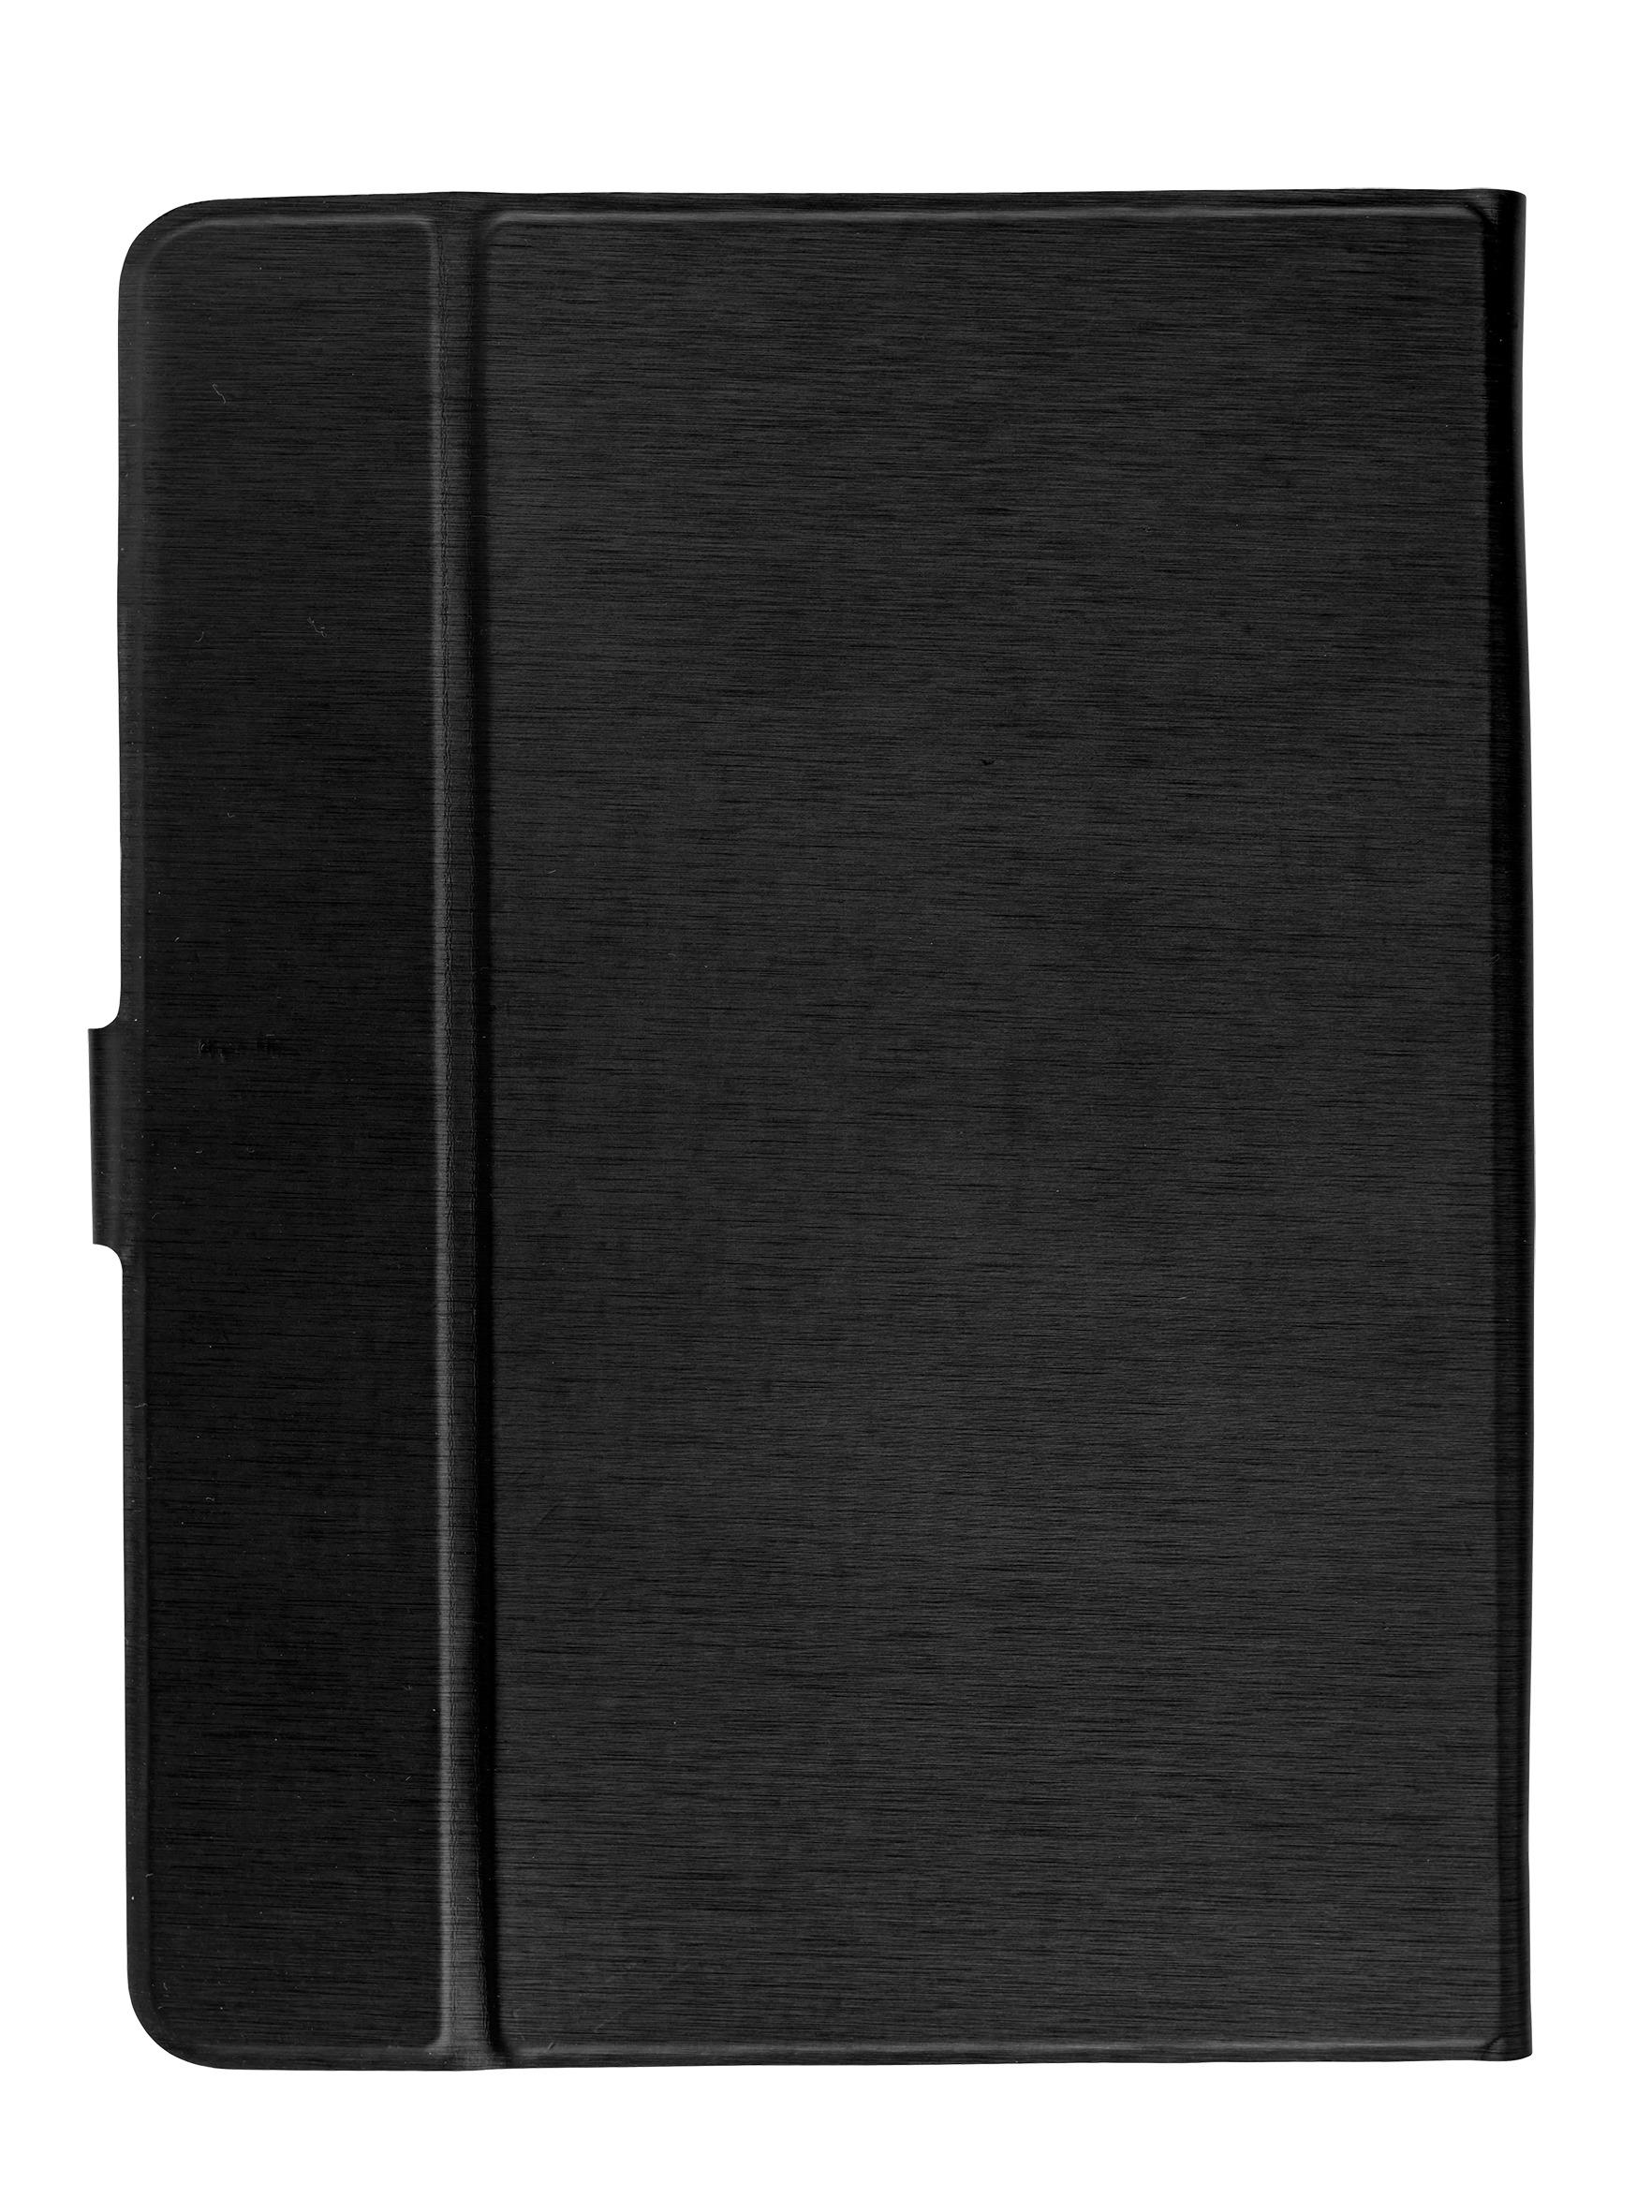 Korting Trust AEXXO FOLIO CASE 10.1i BLACK tablethoesje